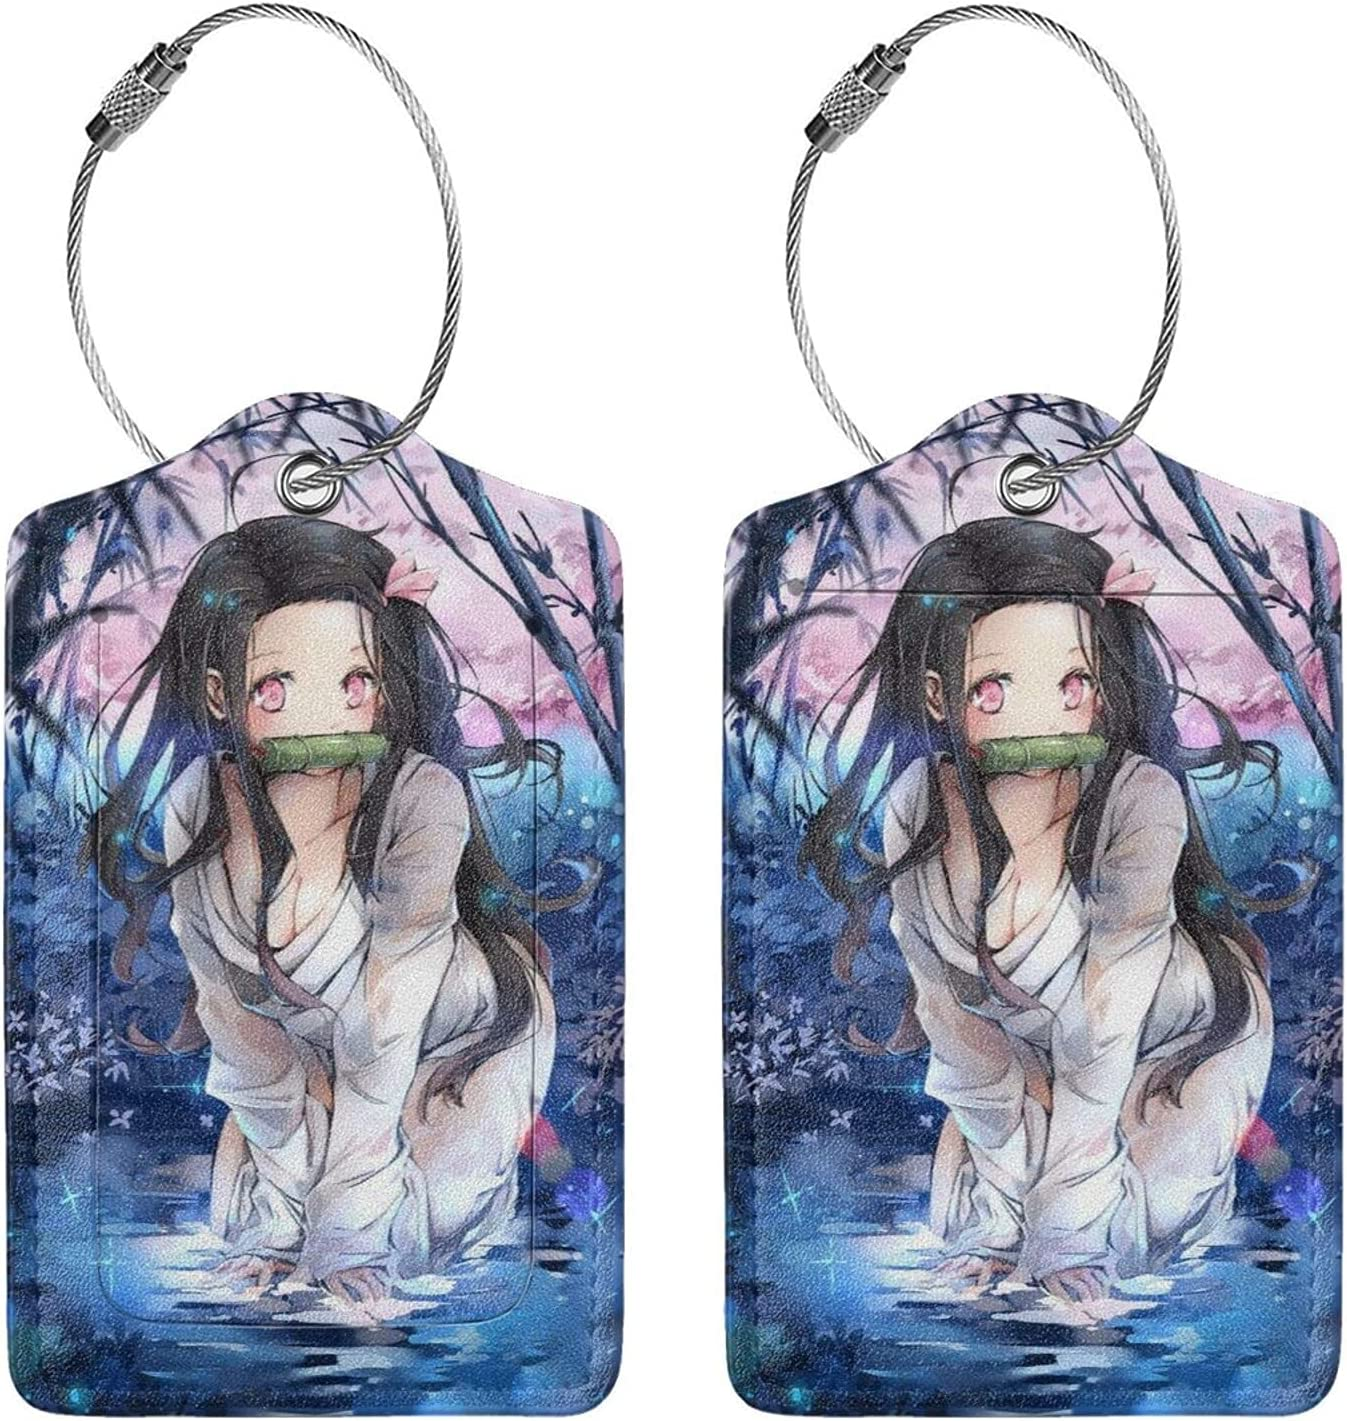 Demon Slayer Nezuko Kamado Anime Luggage Suitcas Daily bargain sale Lightweight Tag Max 40% OFF